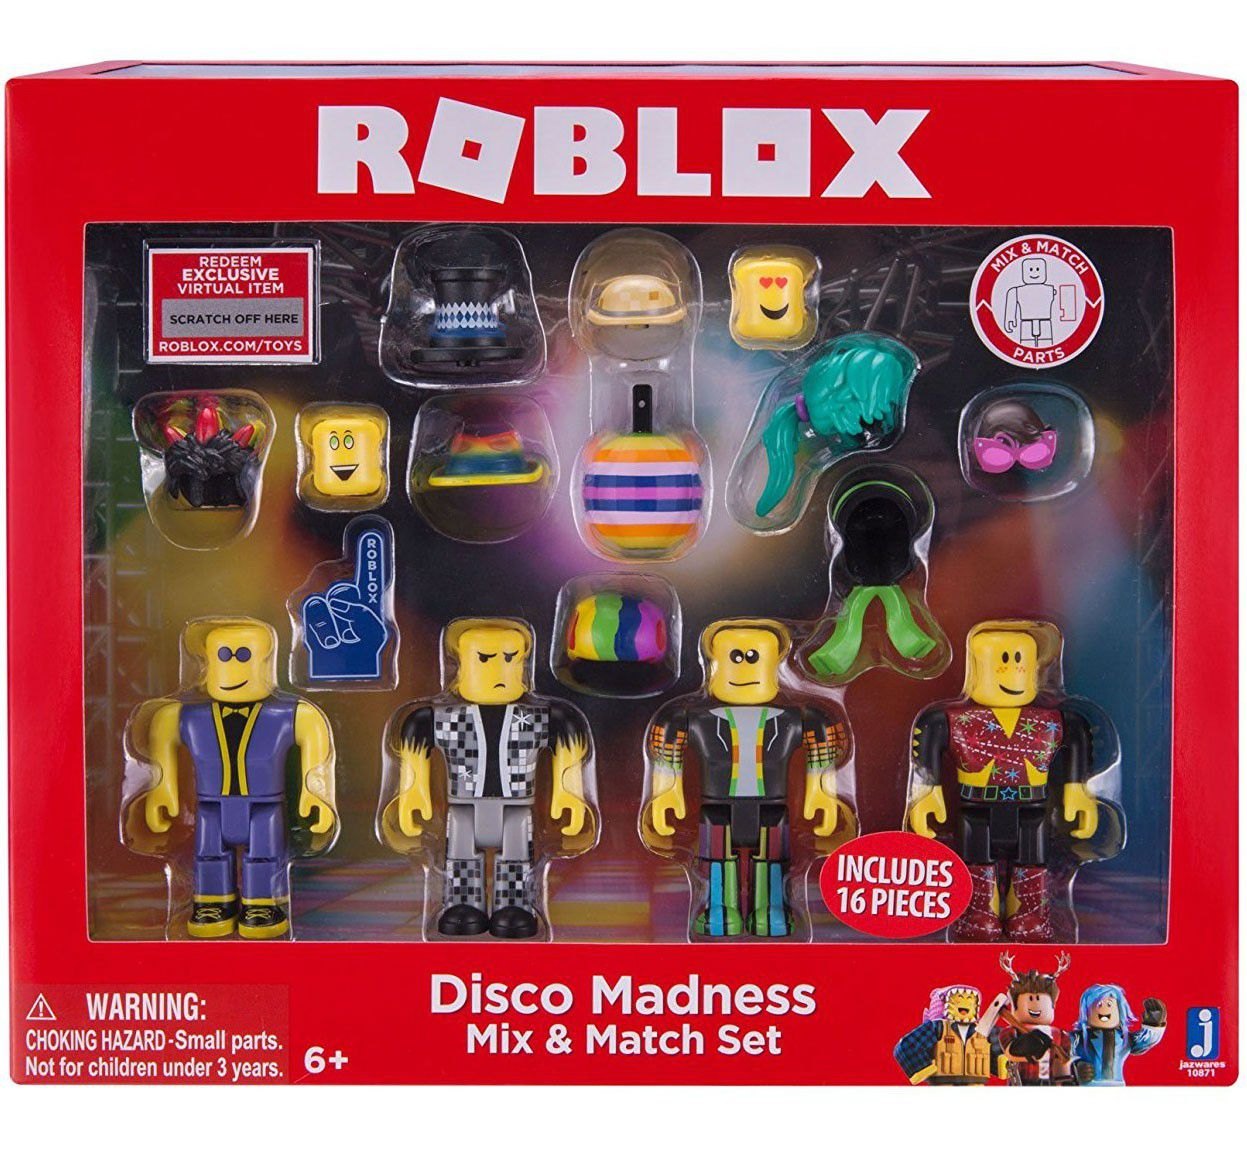 Roblox Mix & Match Disco Madness Figure 4 - Pack Set